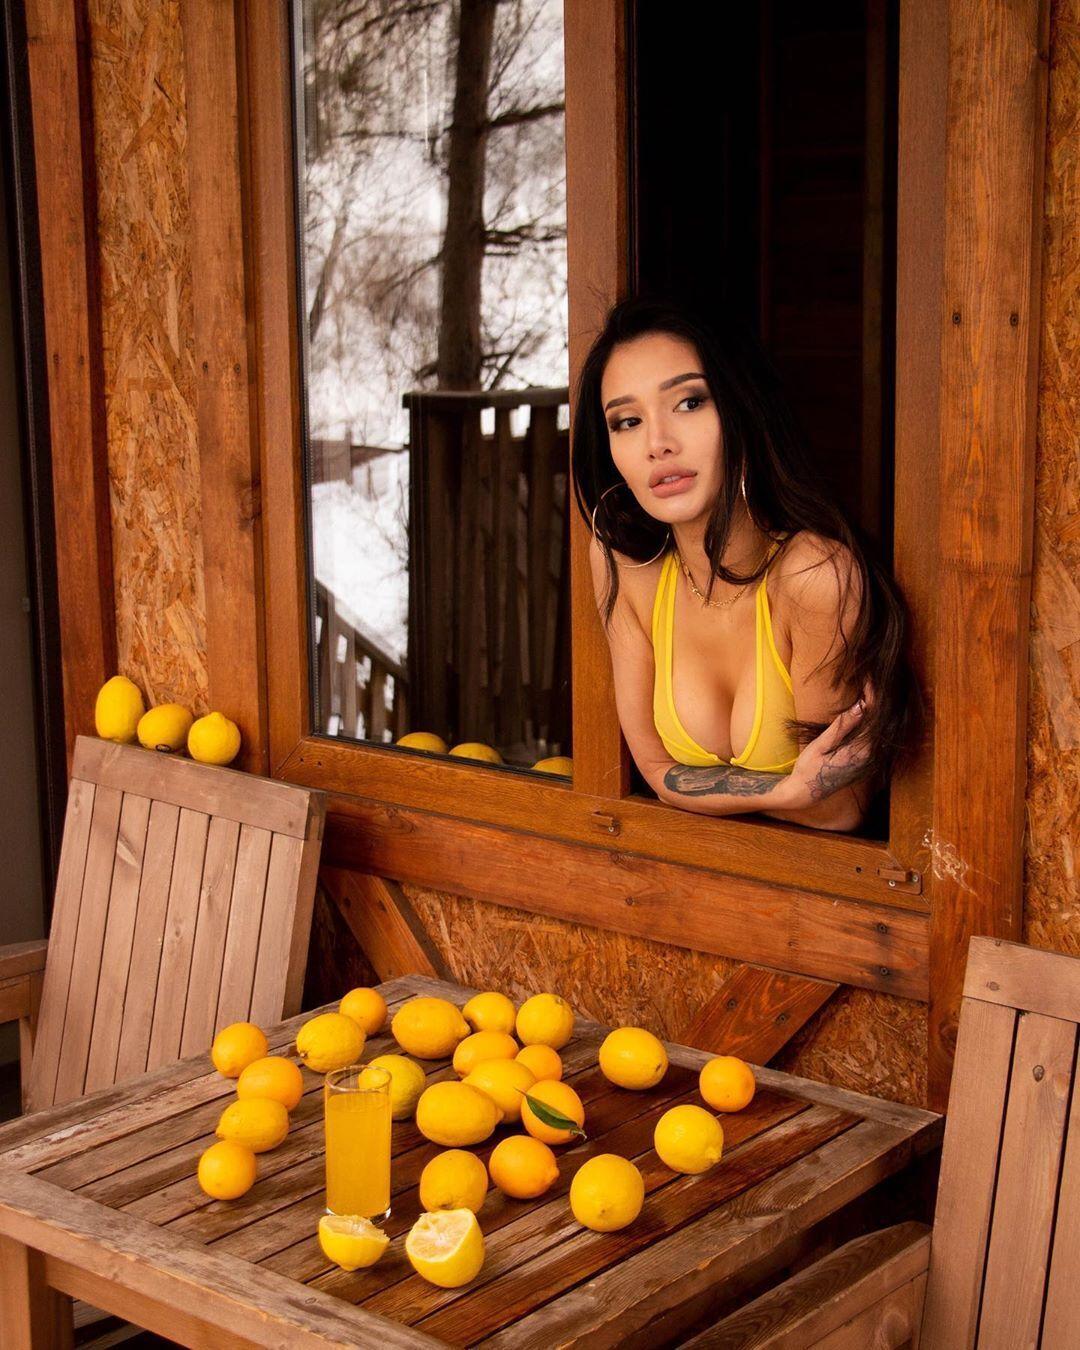 Айжан Байзакова и лимоны